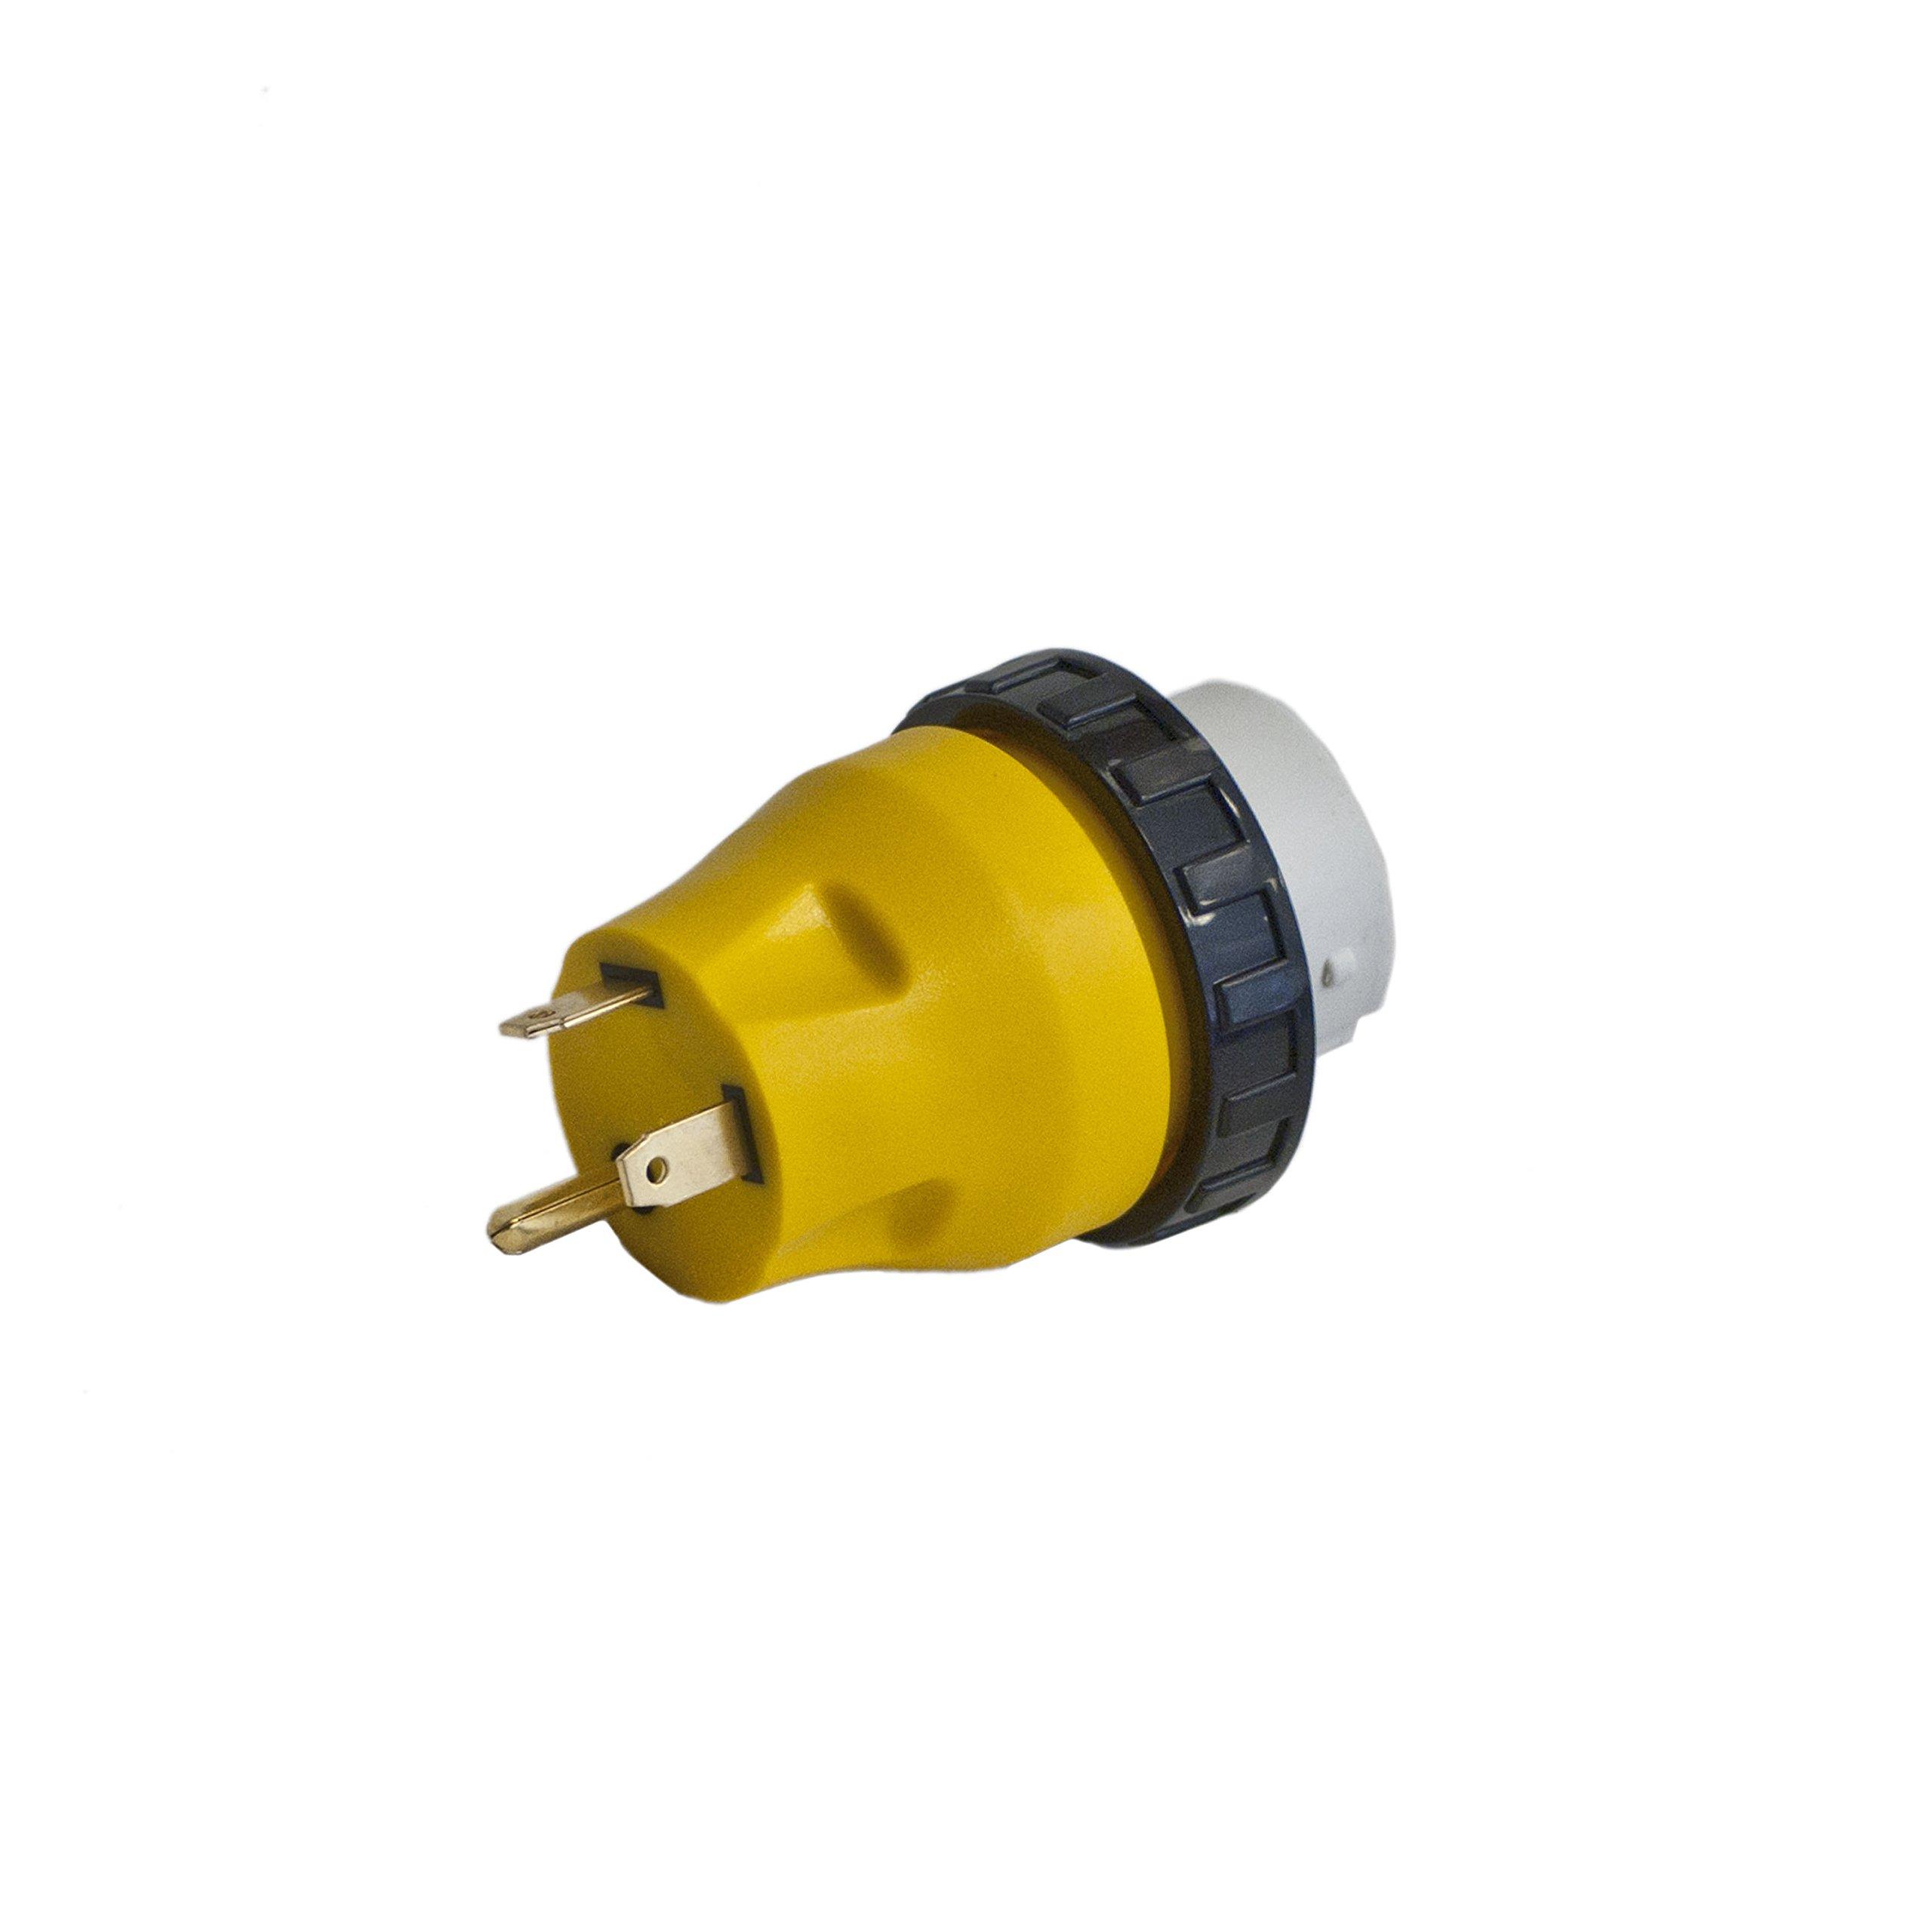 ALEKO L30-50 RV Electrical Locking Adapter 30A Male To 50A Female Locking Plug Connector